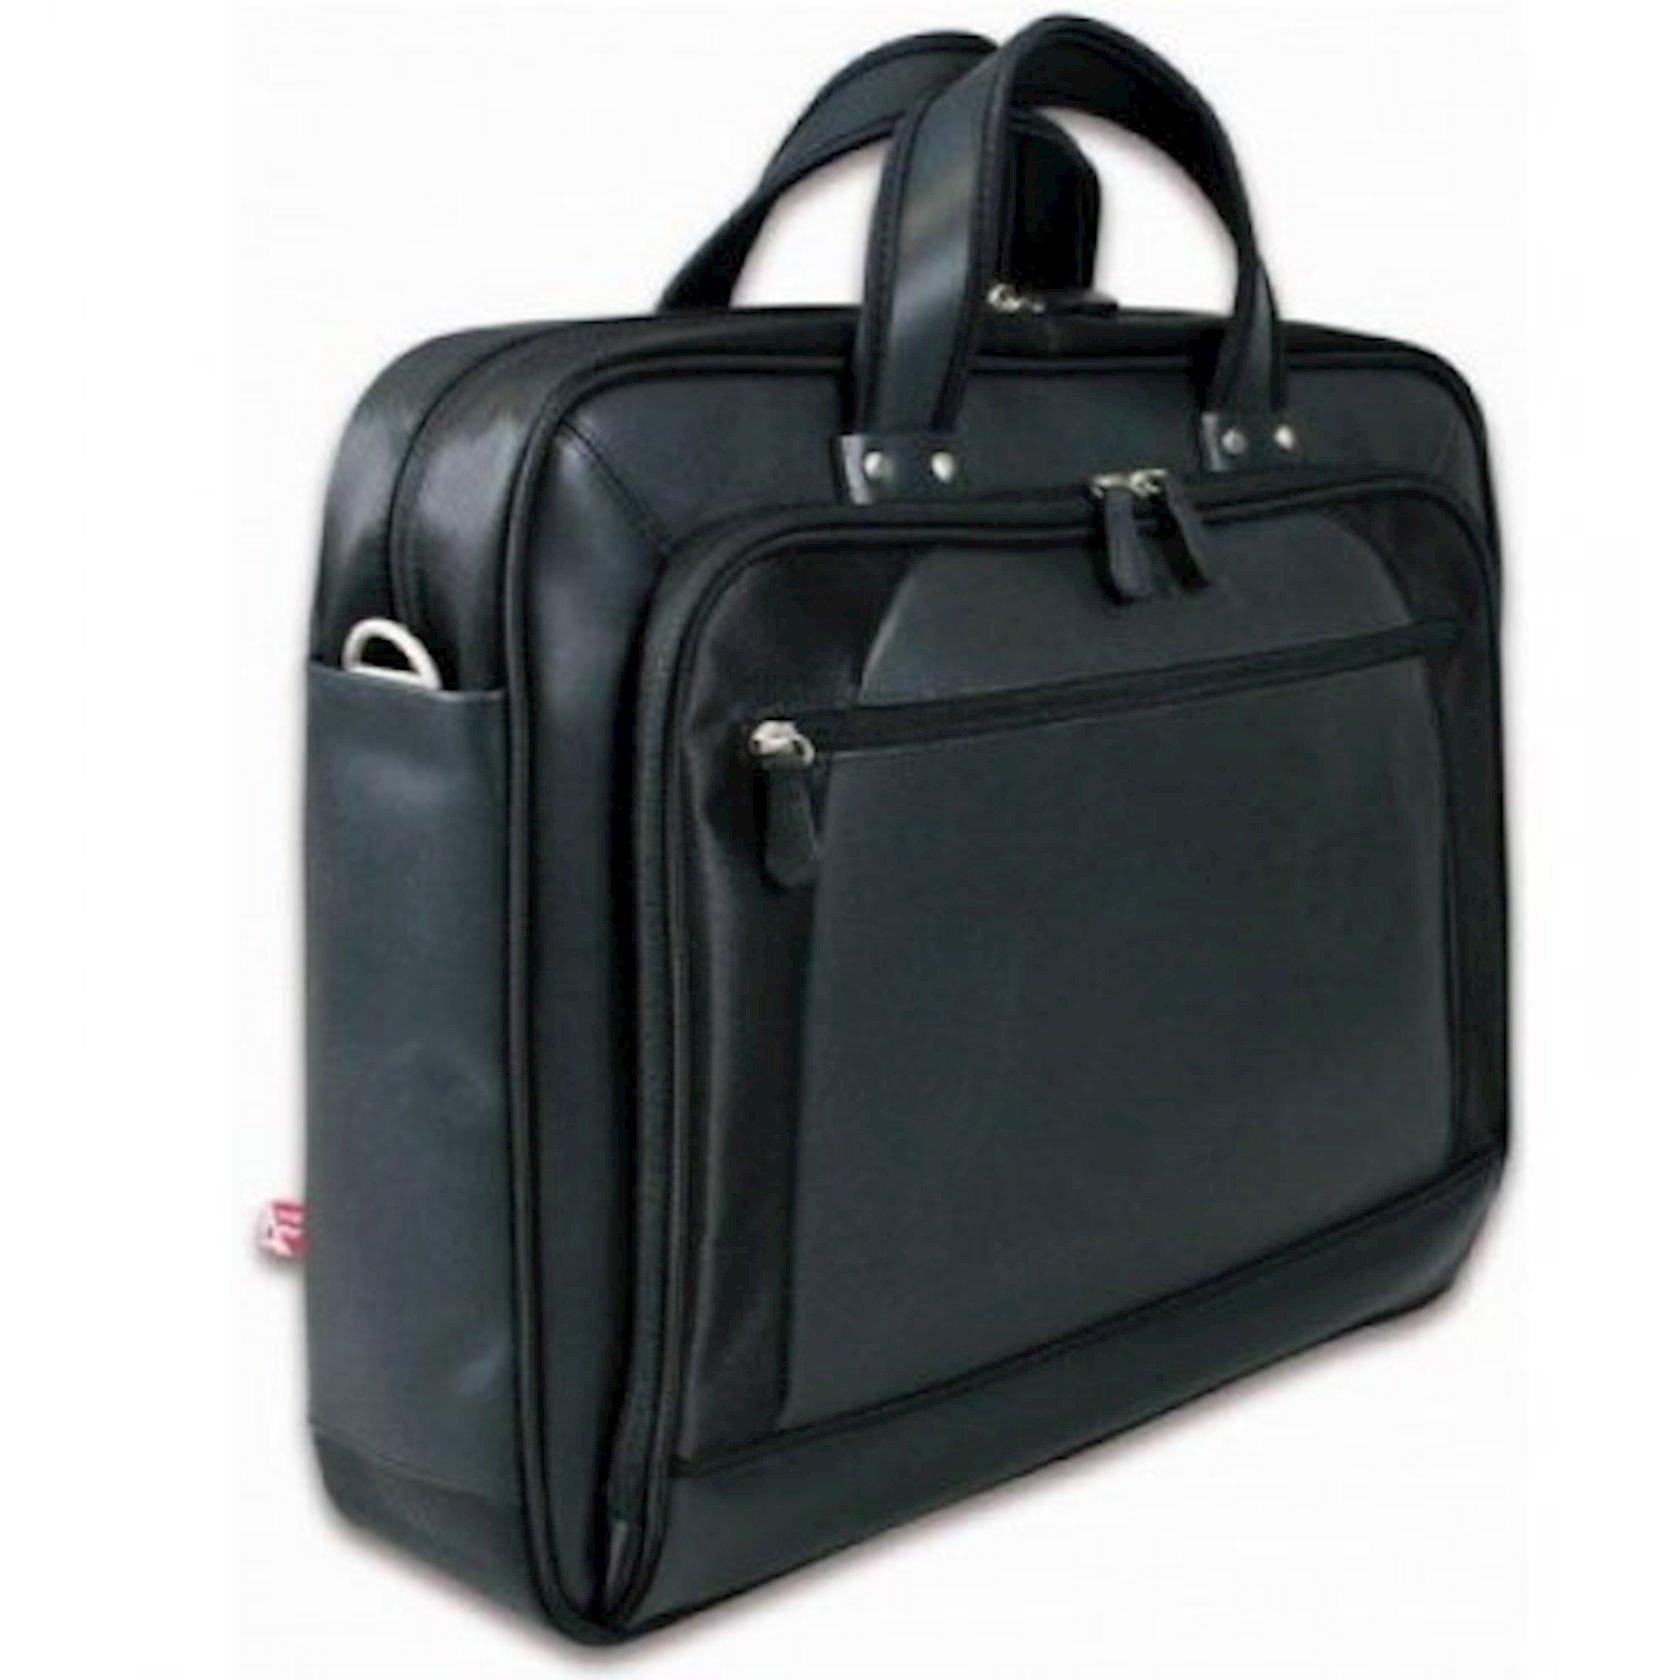 Noutbuk üçün çanta Port Designs Dubai Top Loading 15.6 qara